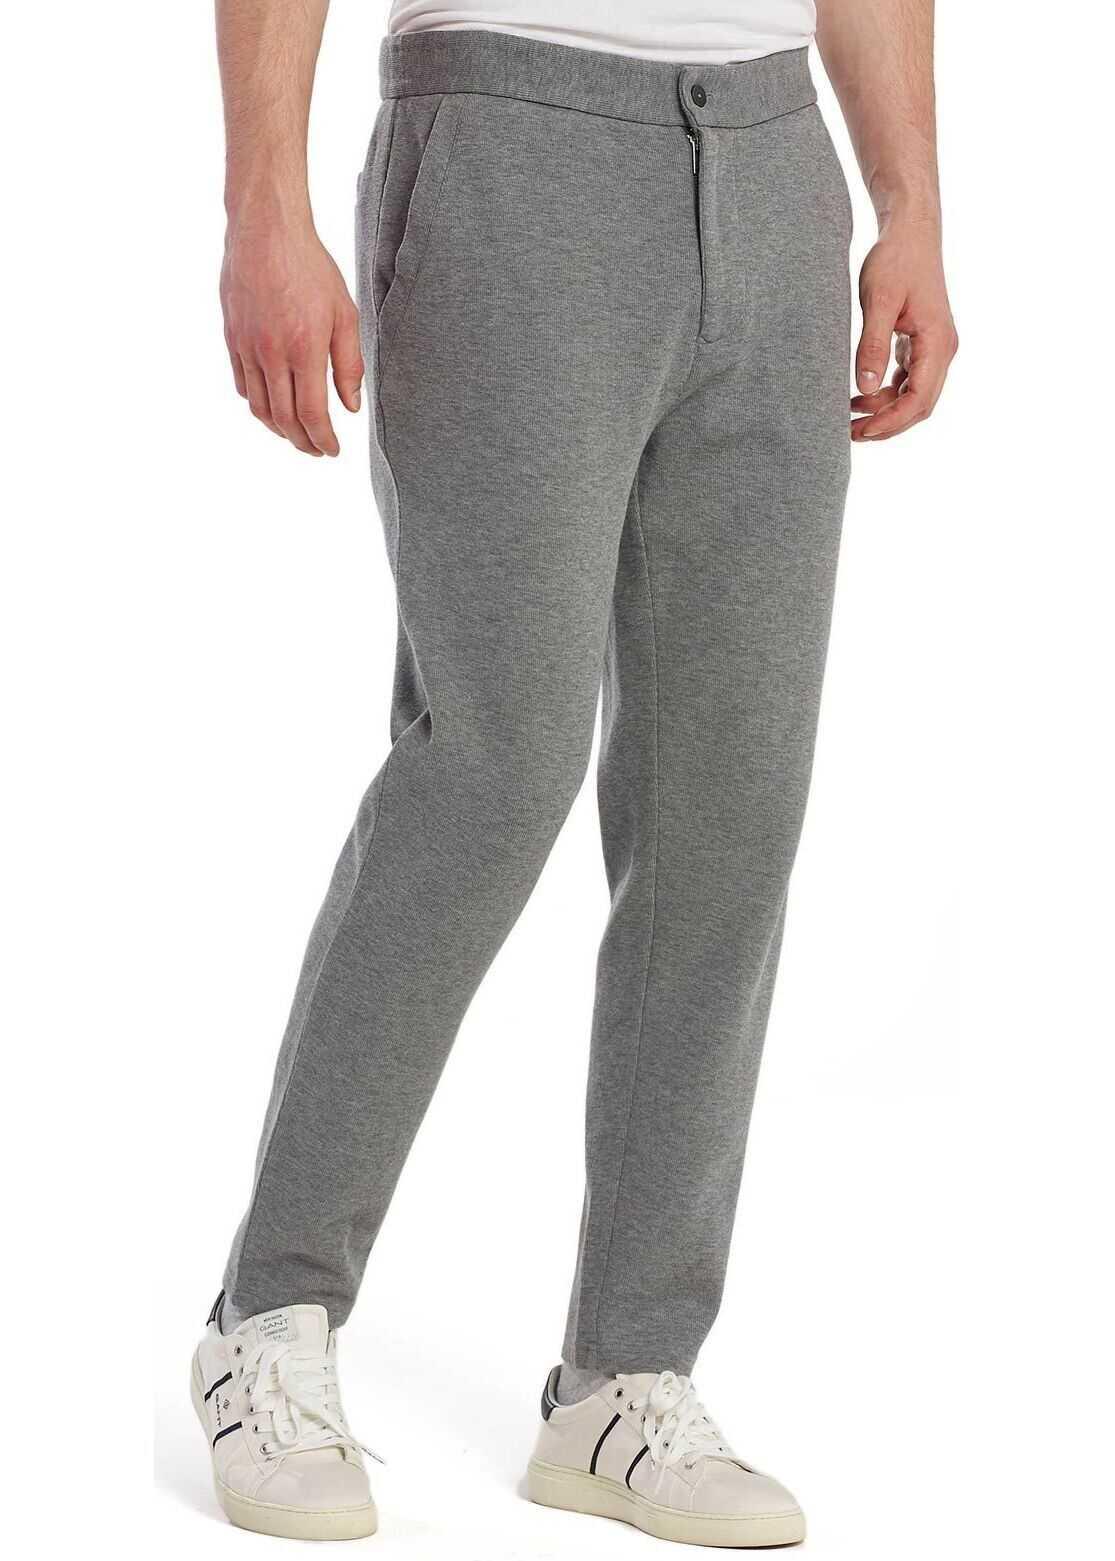 GANT Cotton Pants GREY